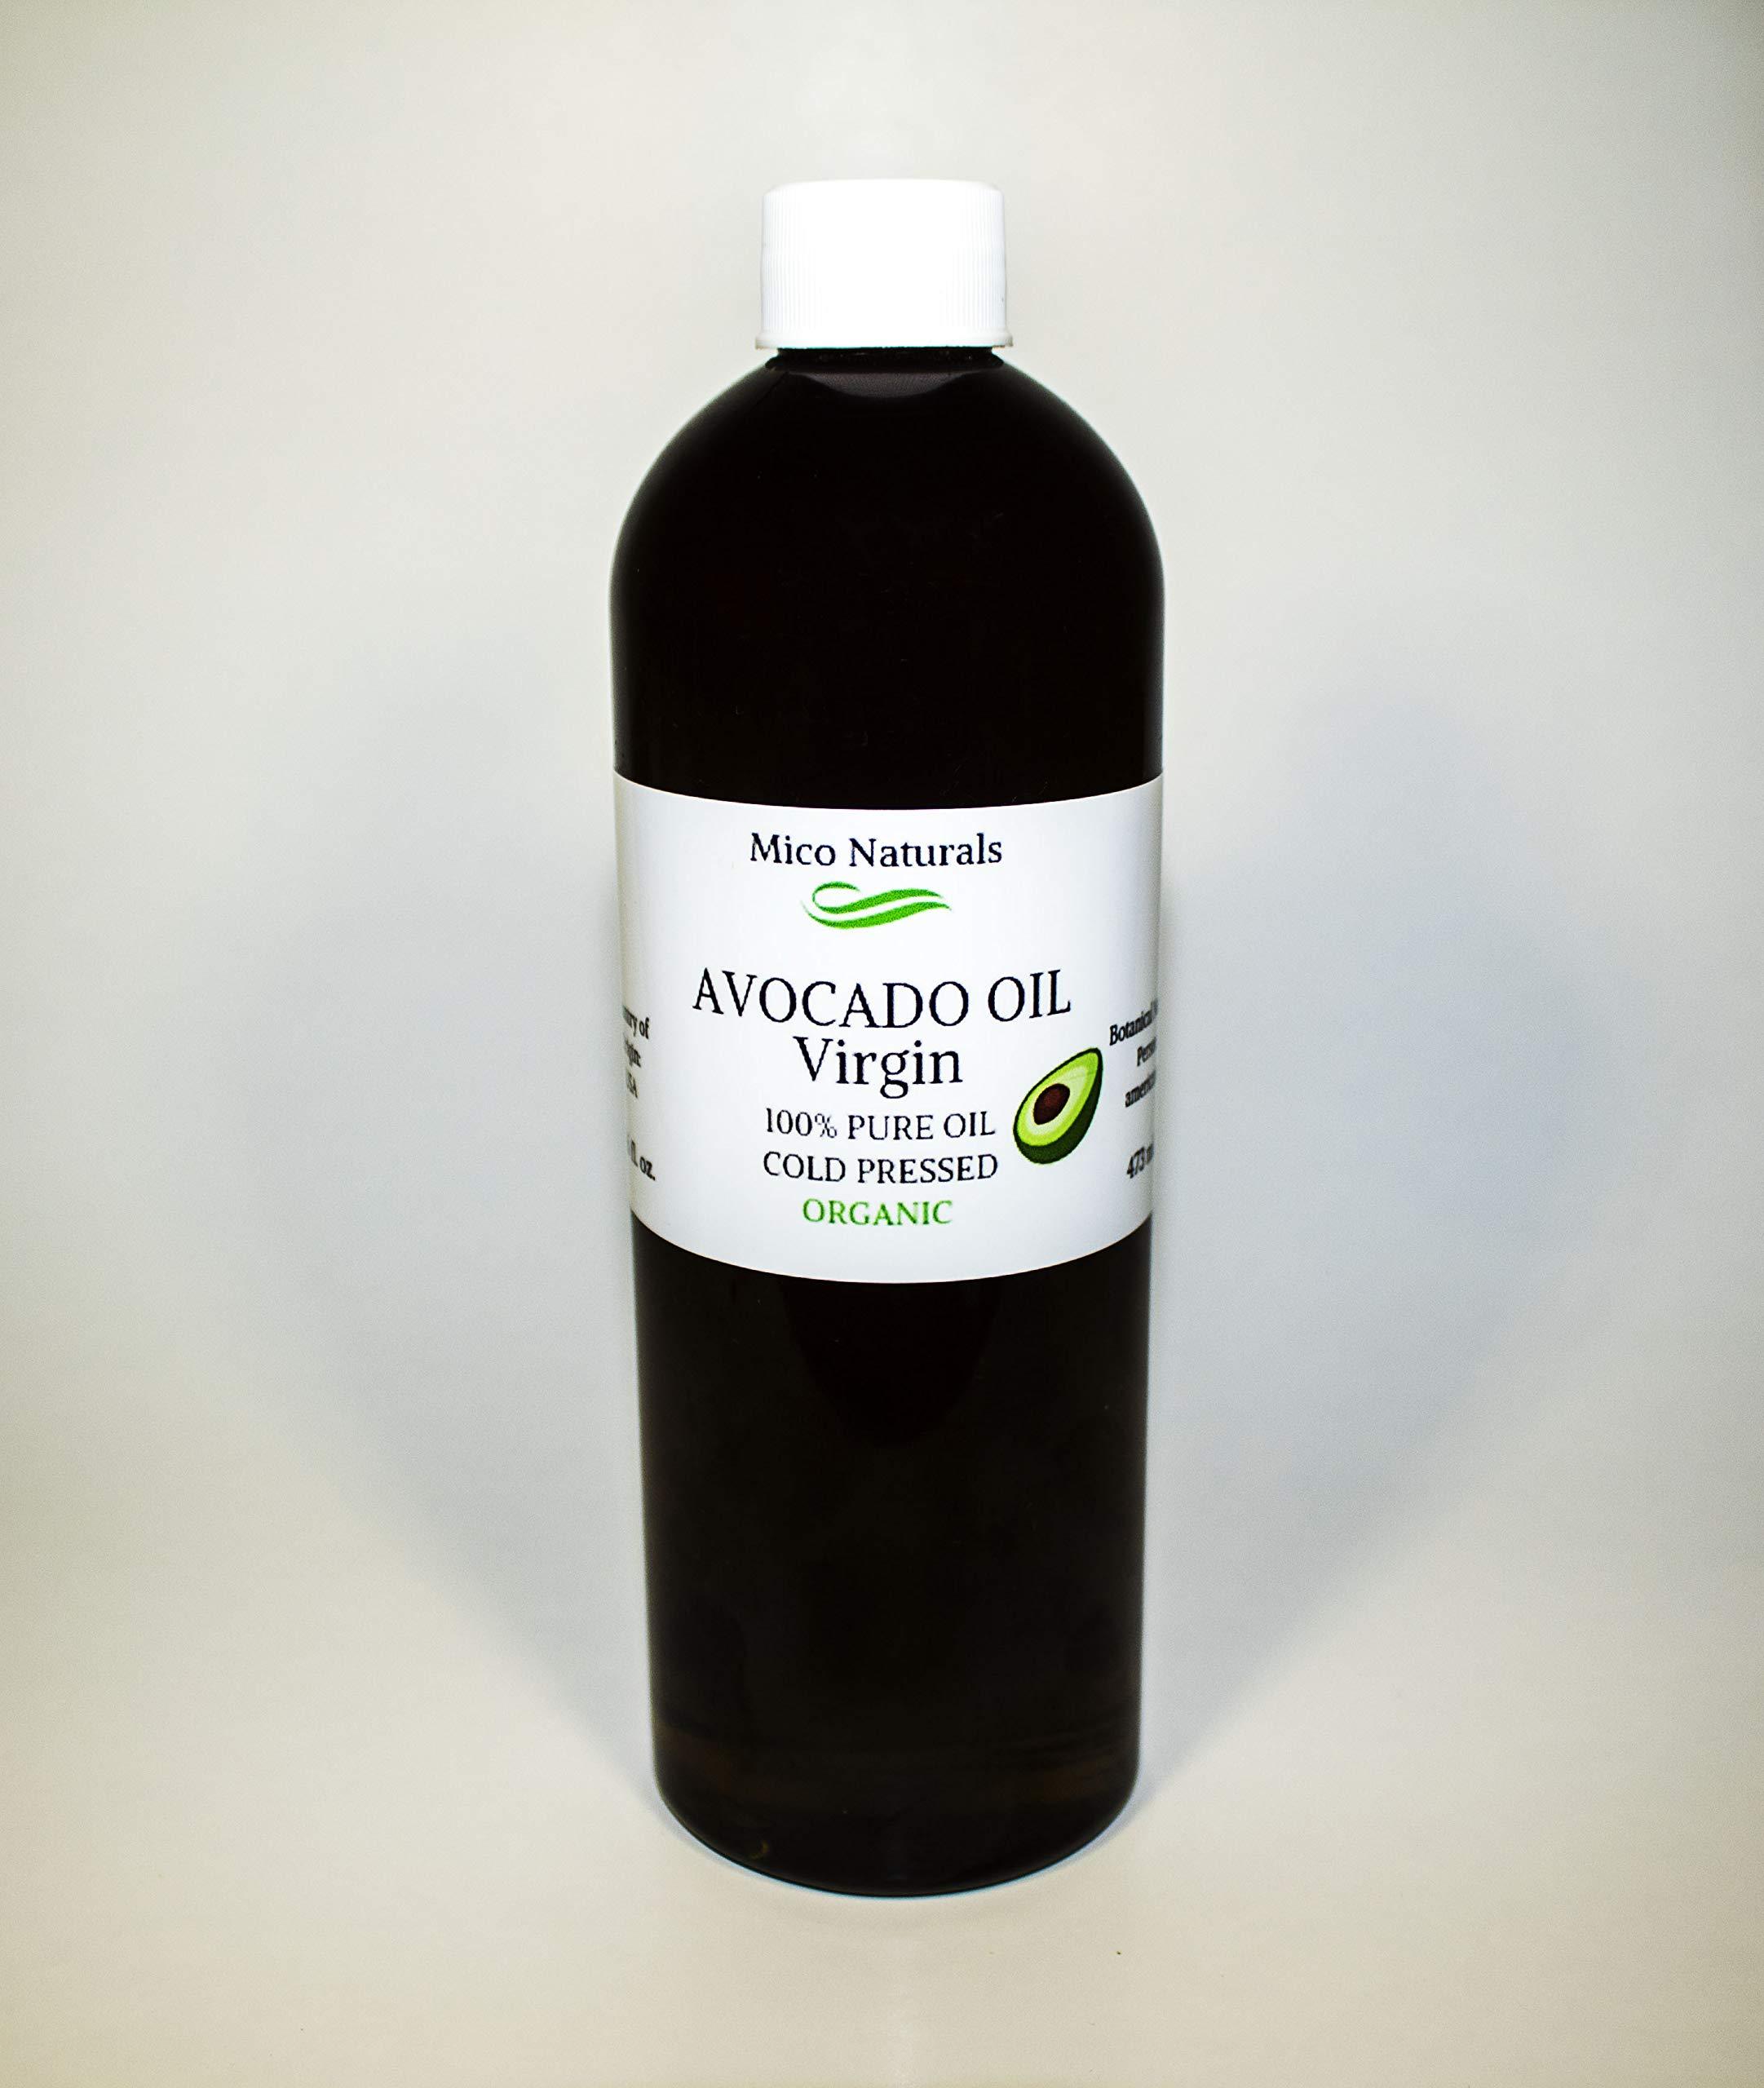 Avocado Oil Virgin Unrefined Organic 16 fl. oz. by Mico Naturals Co. by Mico Naturals